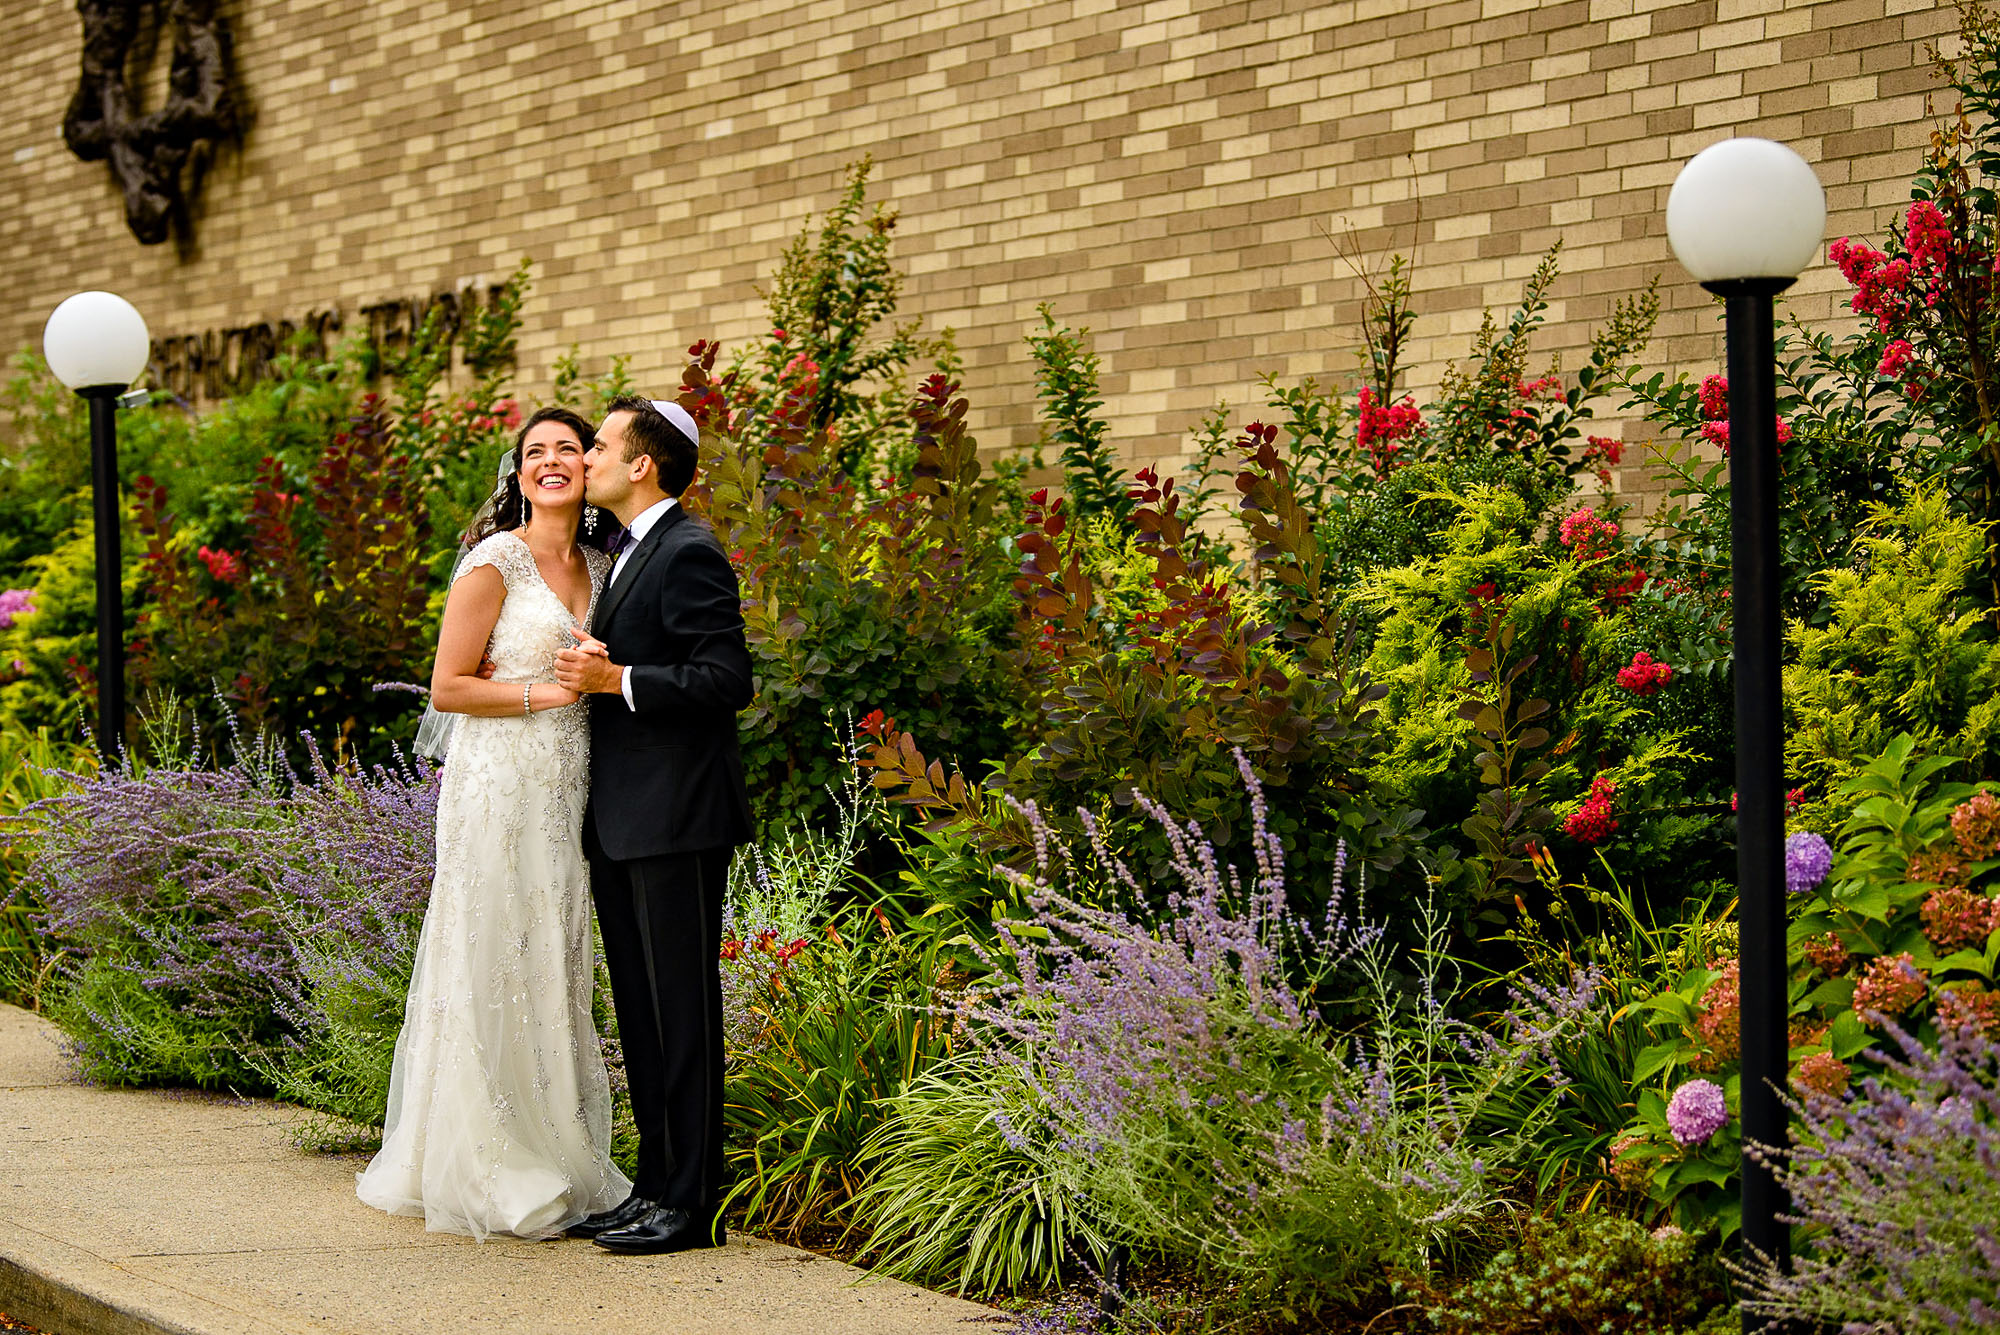 The Sephardic Temple wedding portrait